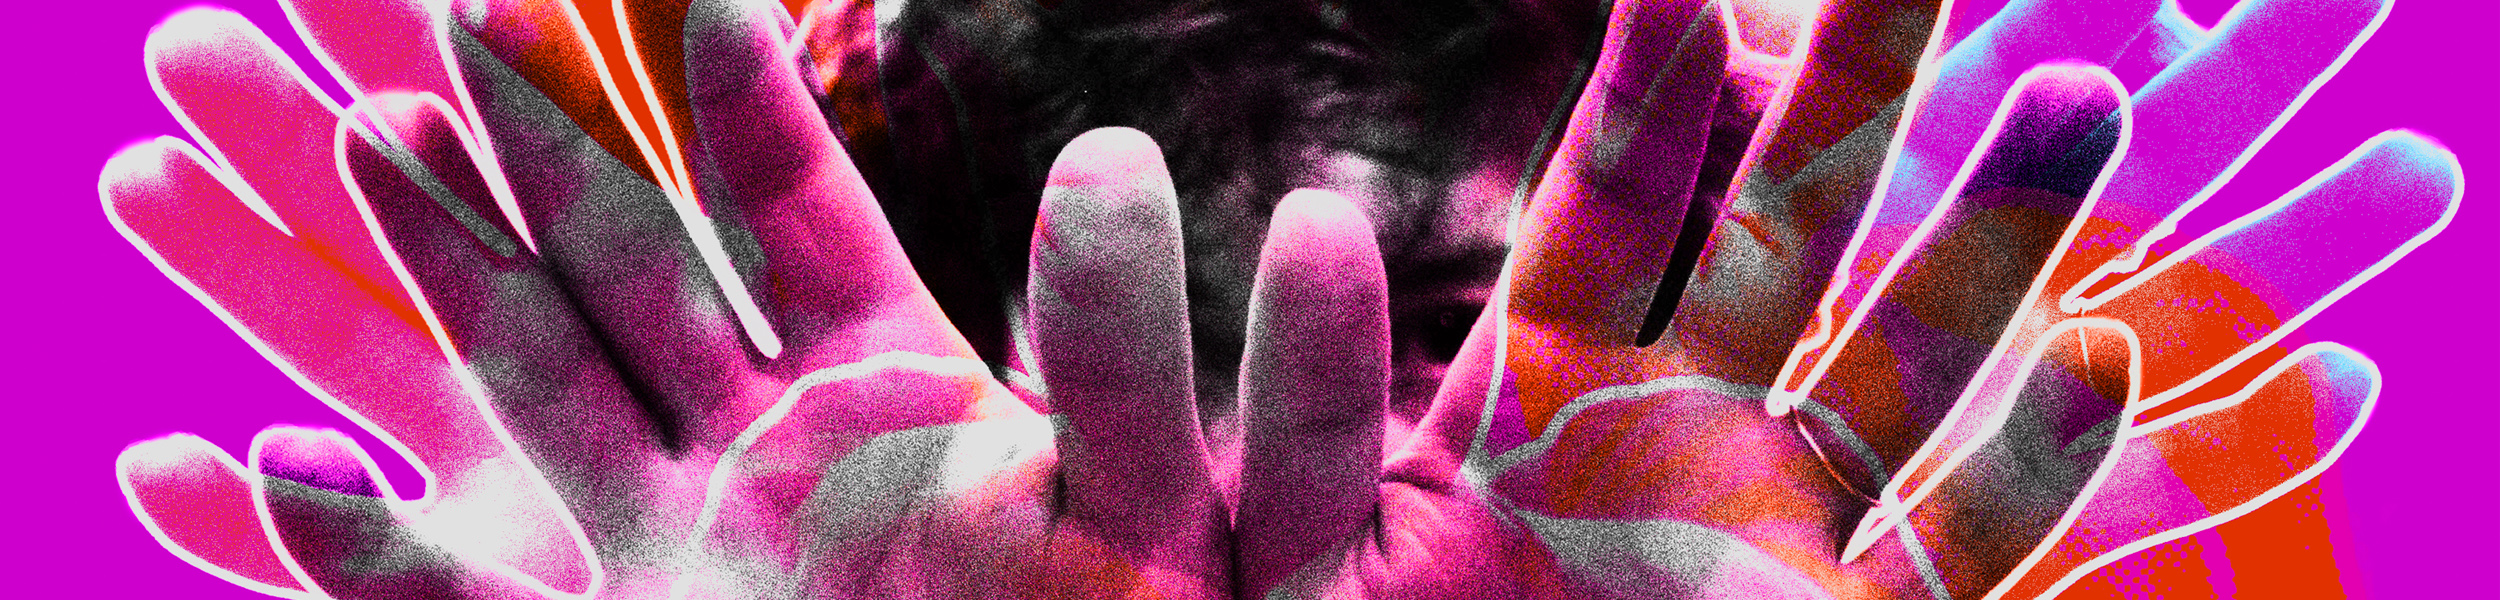 Tune-Yards - '... creep... Remixes' Project Featuring Sylvan Esso, Suzi Analogue, U.S. Girls